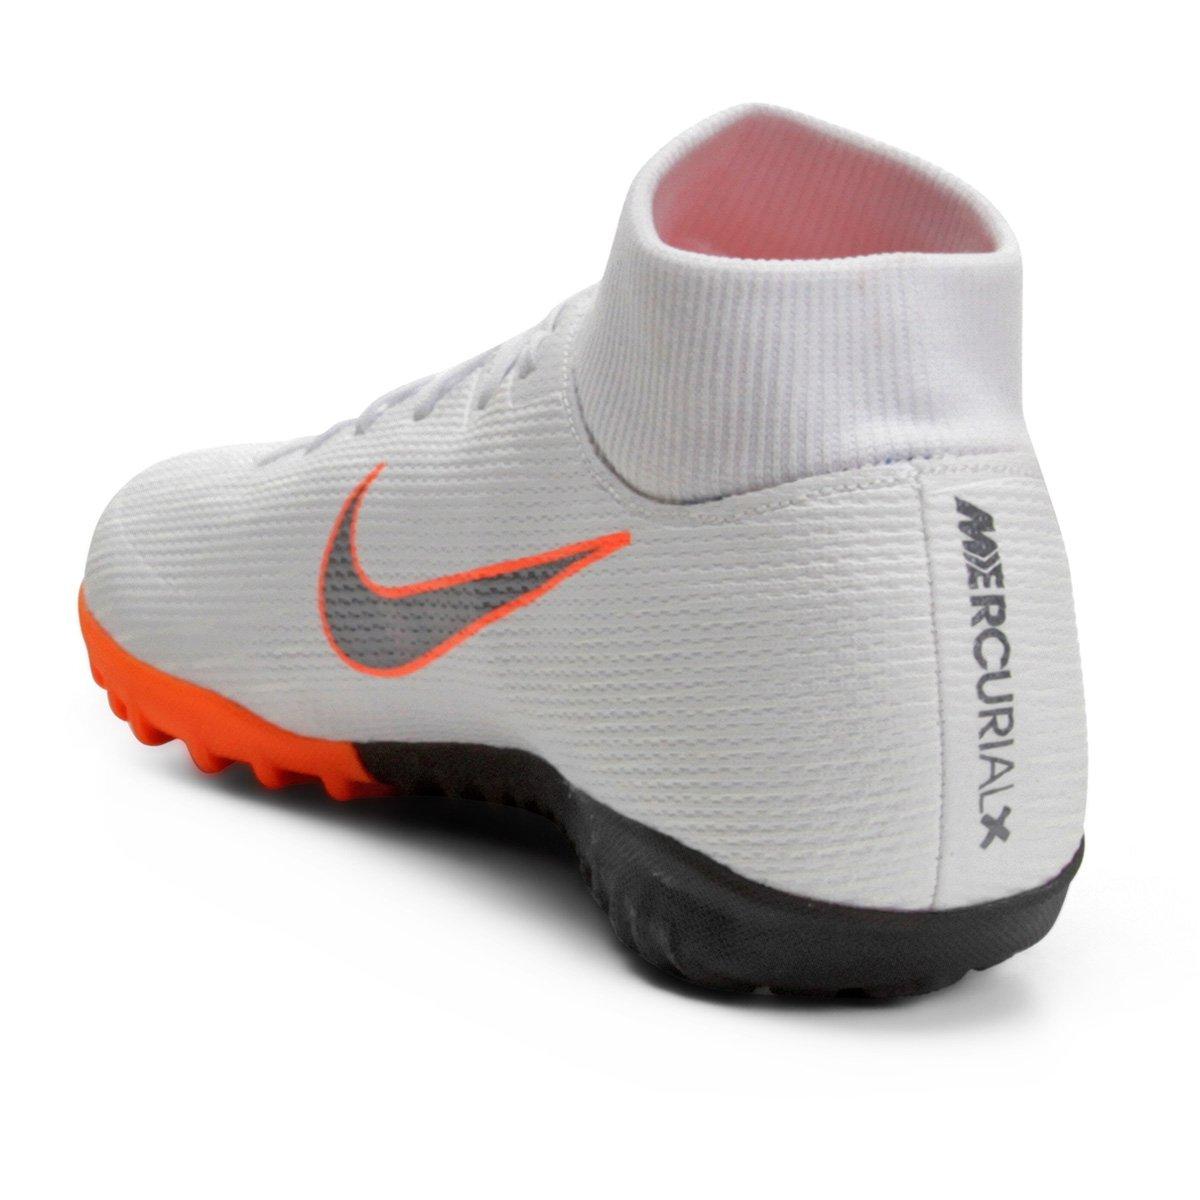 Chuteira Society Nike Mercurial Superfly 6 Academy - Branco e Cinza ... 3bbbc1b58c1e9